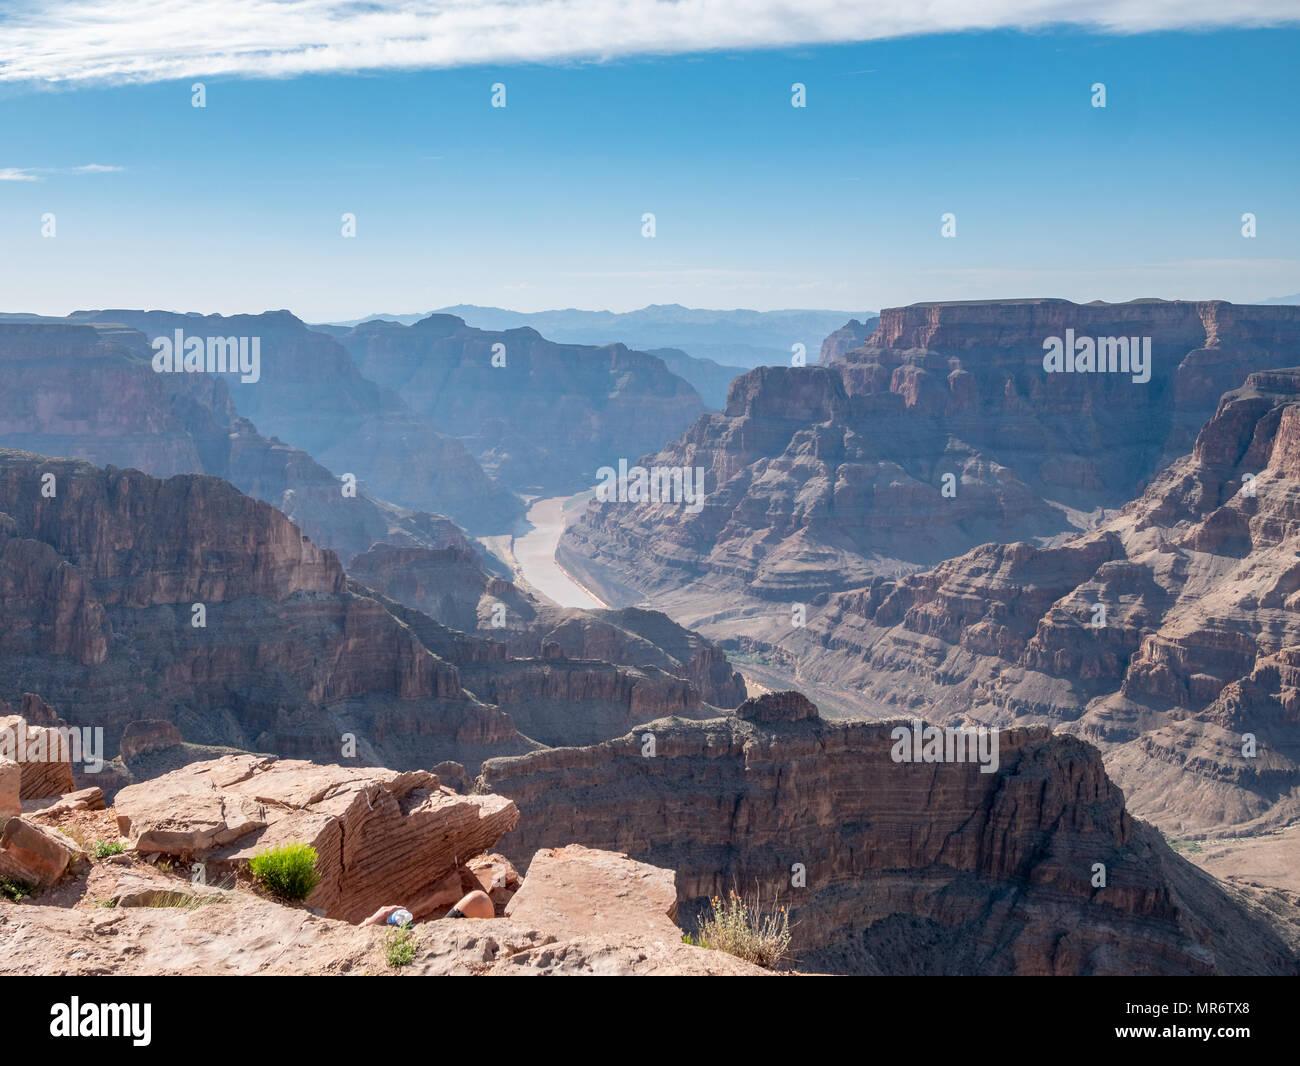 Colorado River Inside the Grand Canyon in Arizona - Stock Image